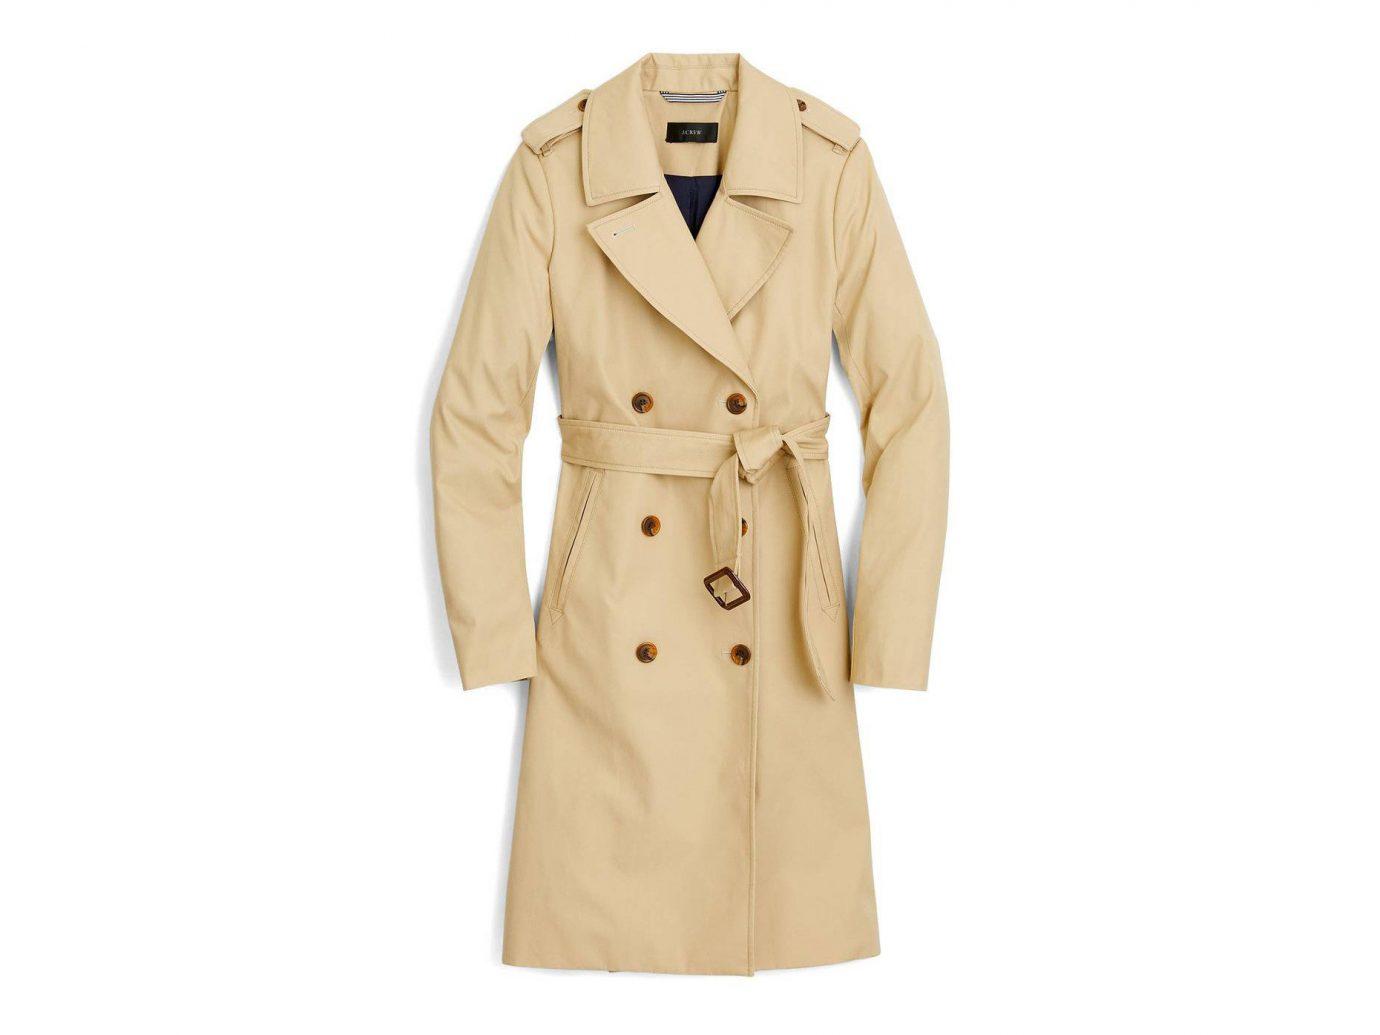 France Style + Design Travel Shop coat clothing trench coat overcoat beige